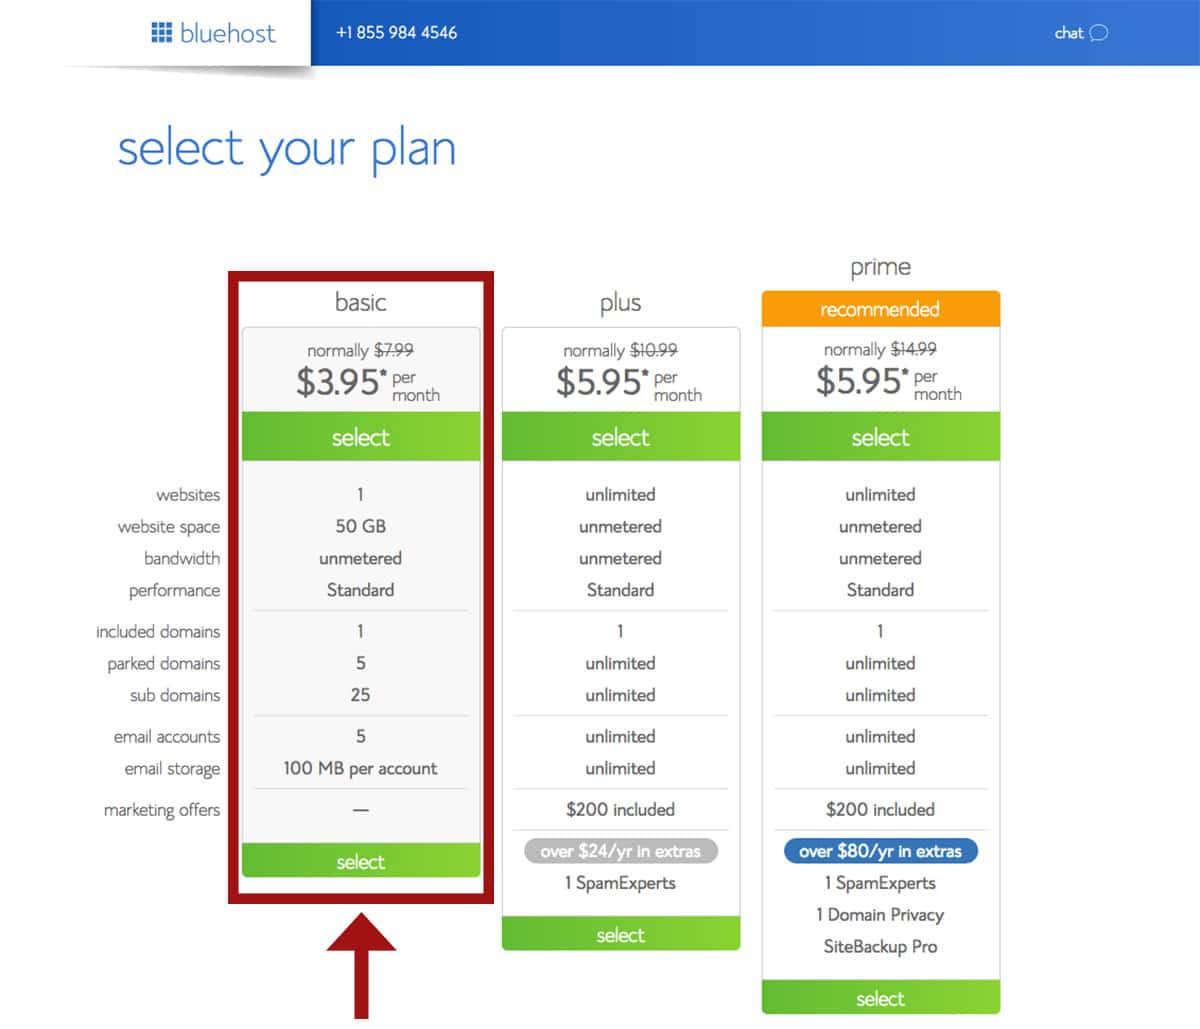 Bluehost hosting plan descriptions